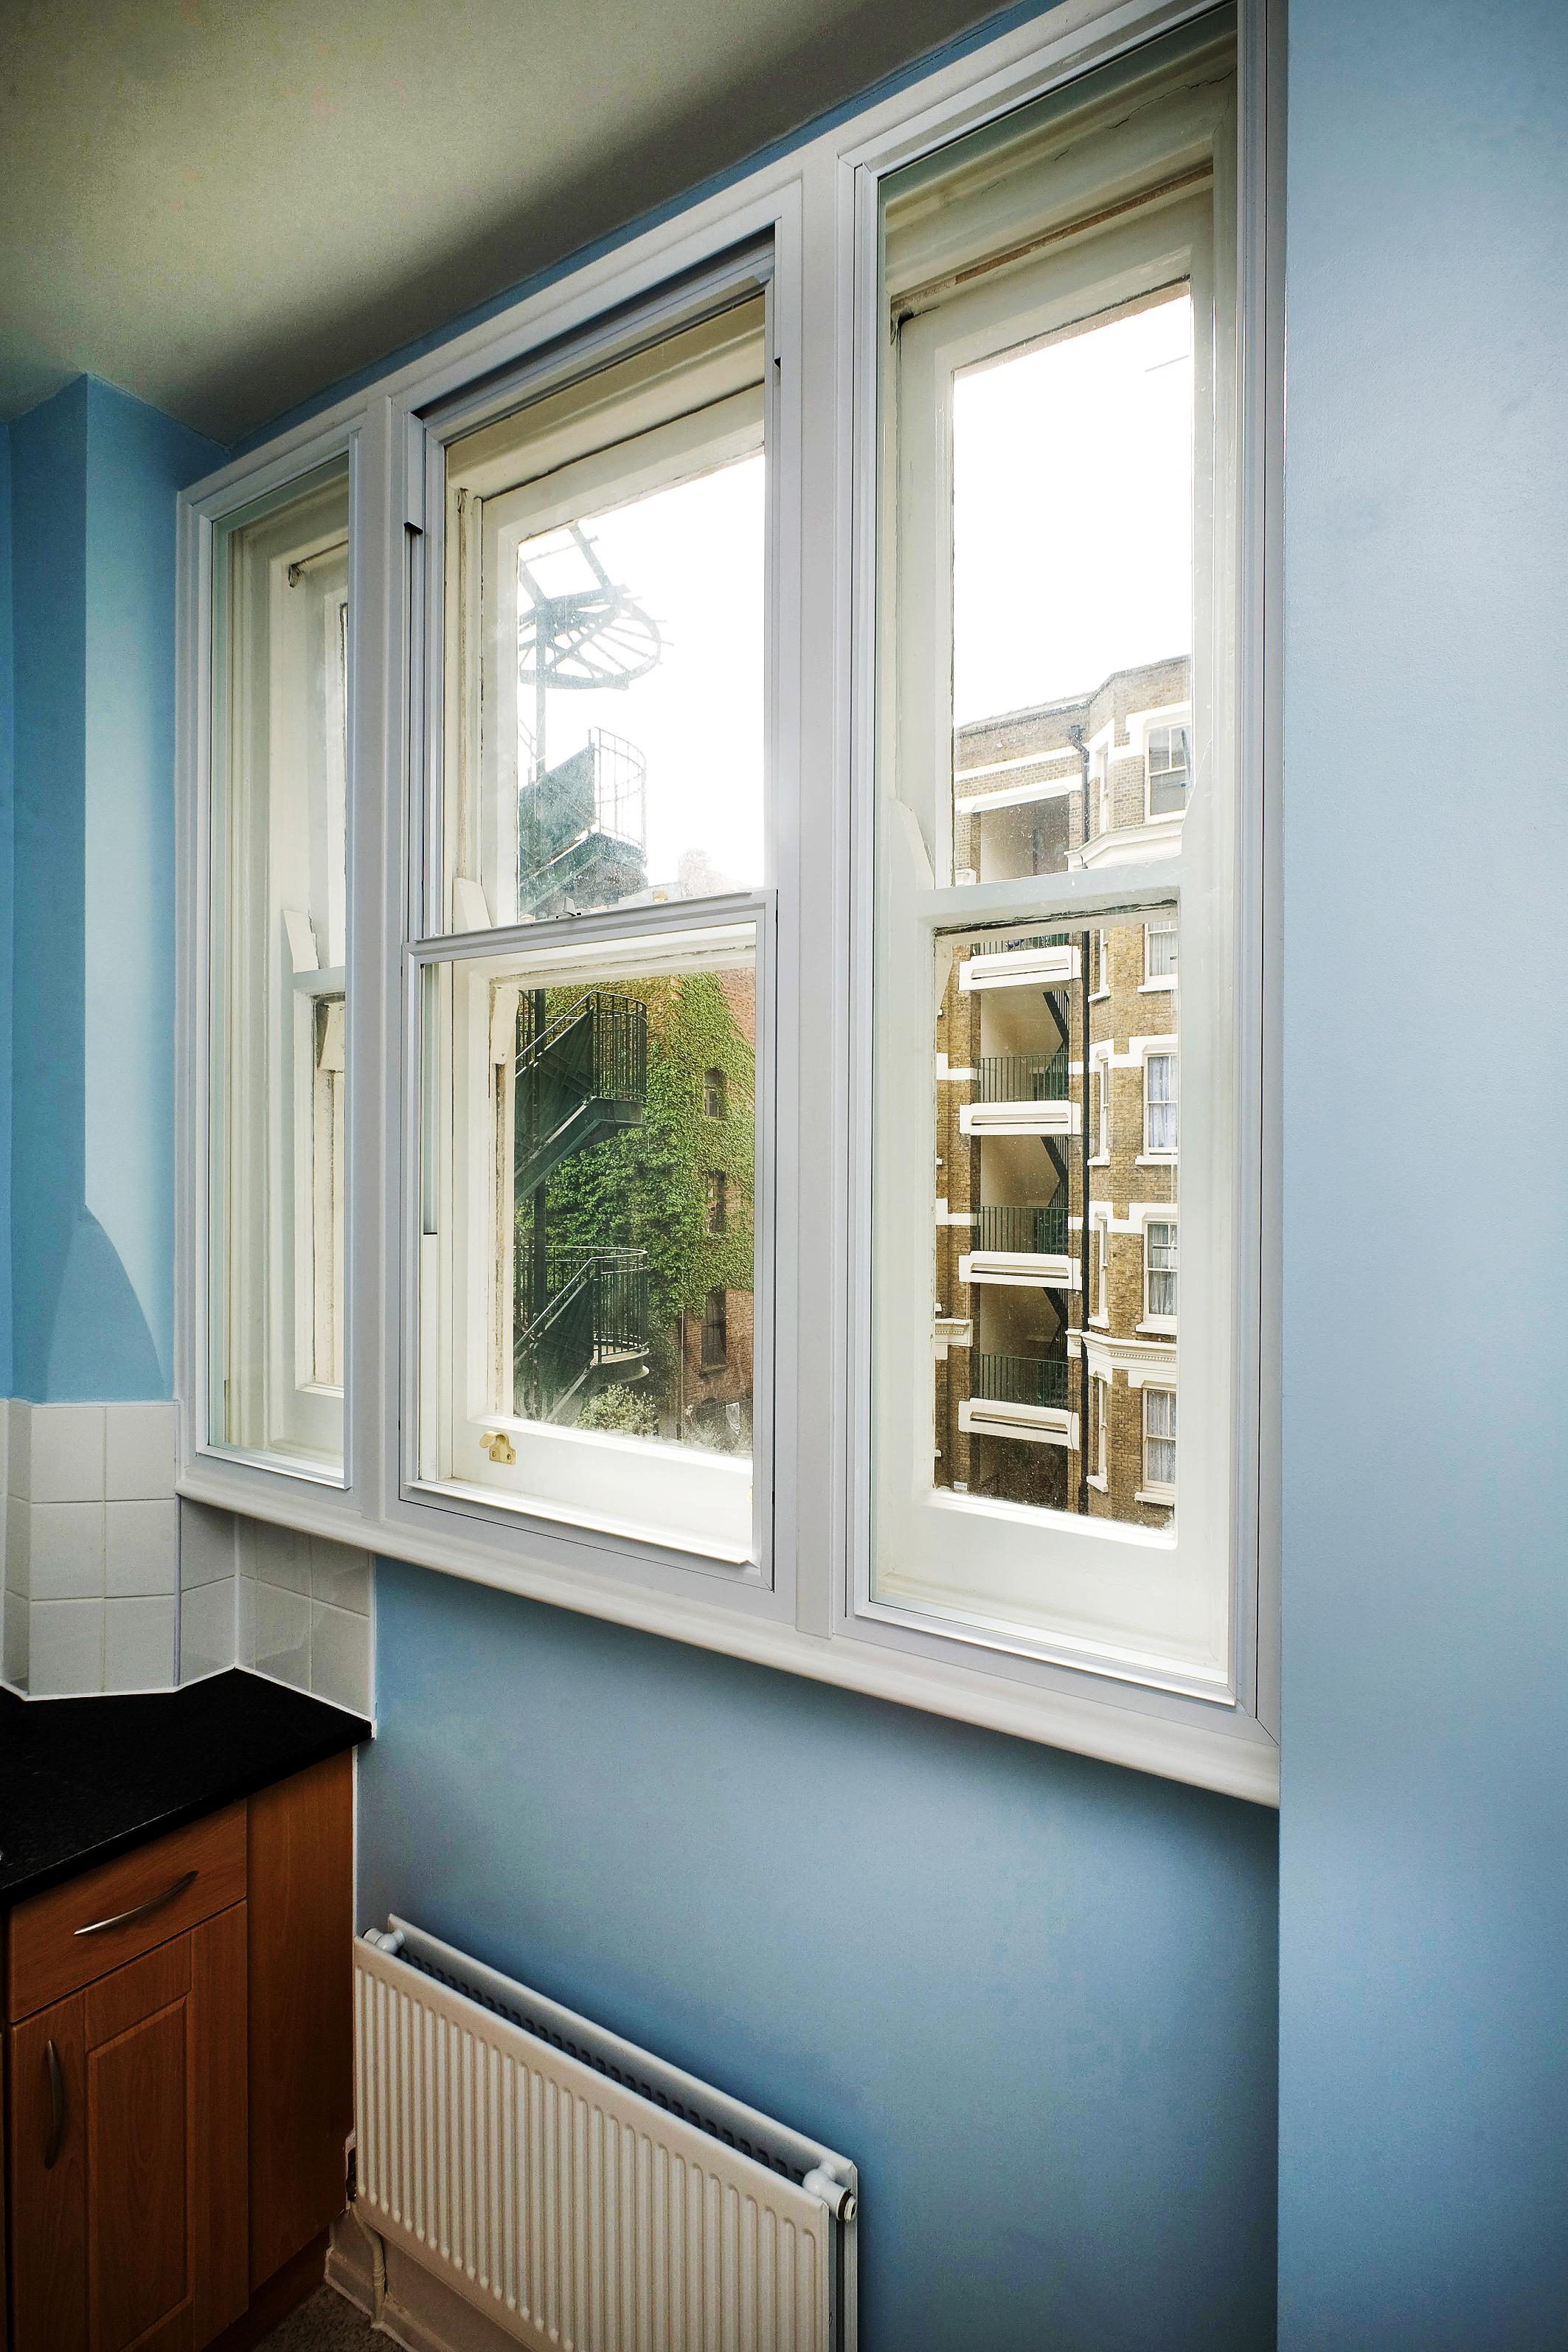 Secondary glazing in progress